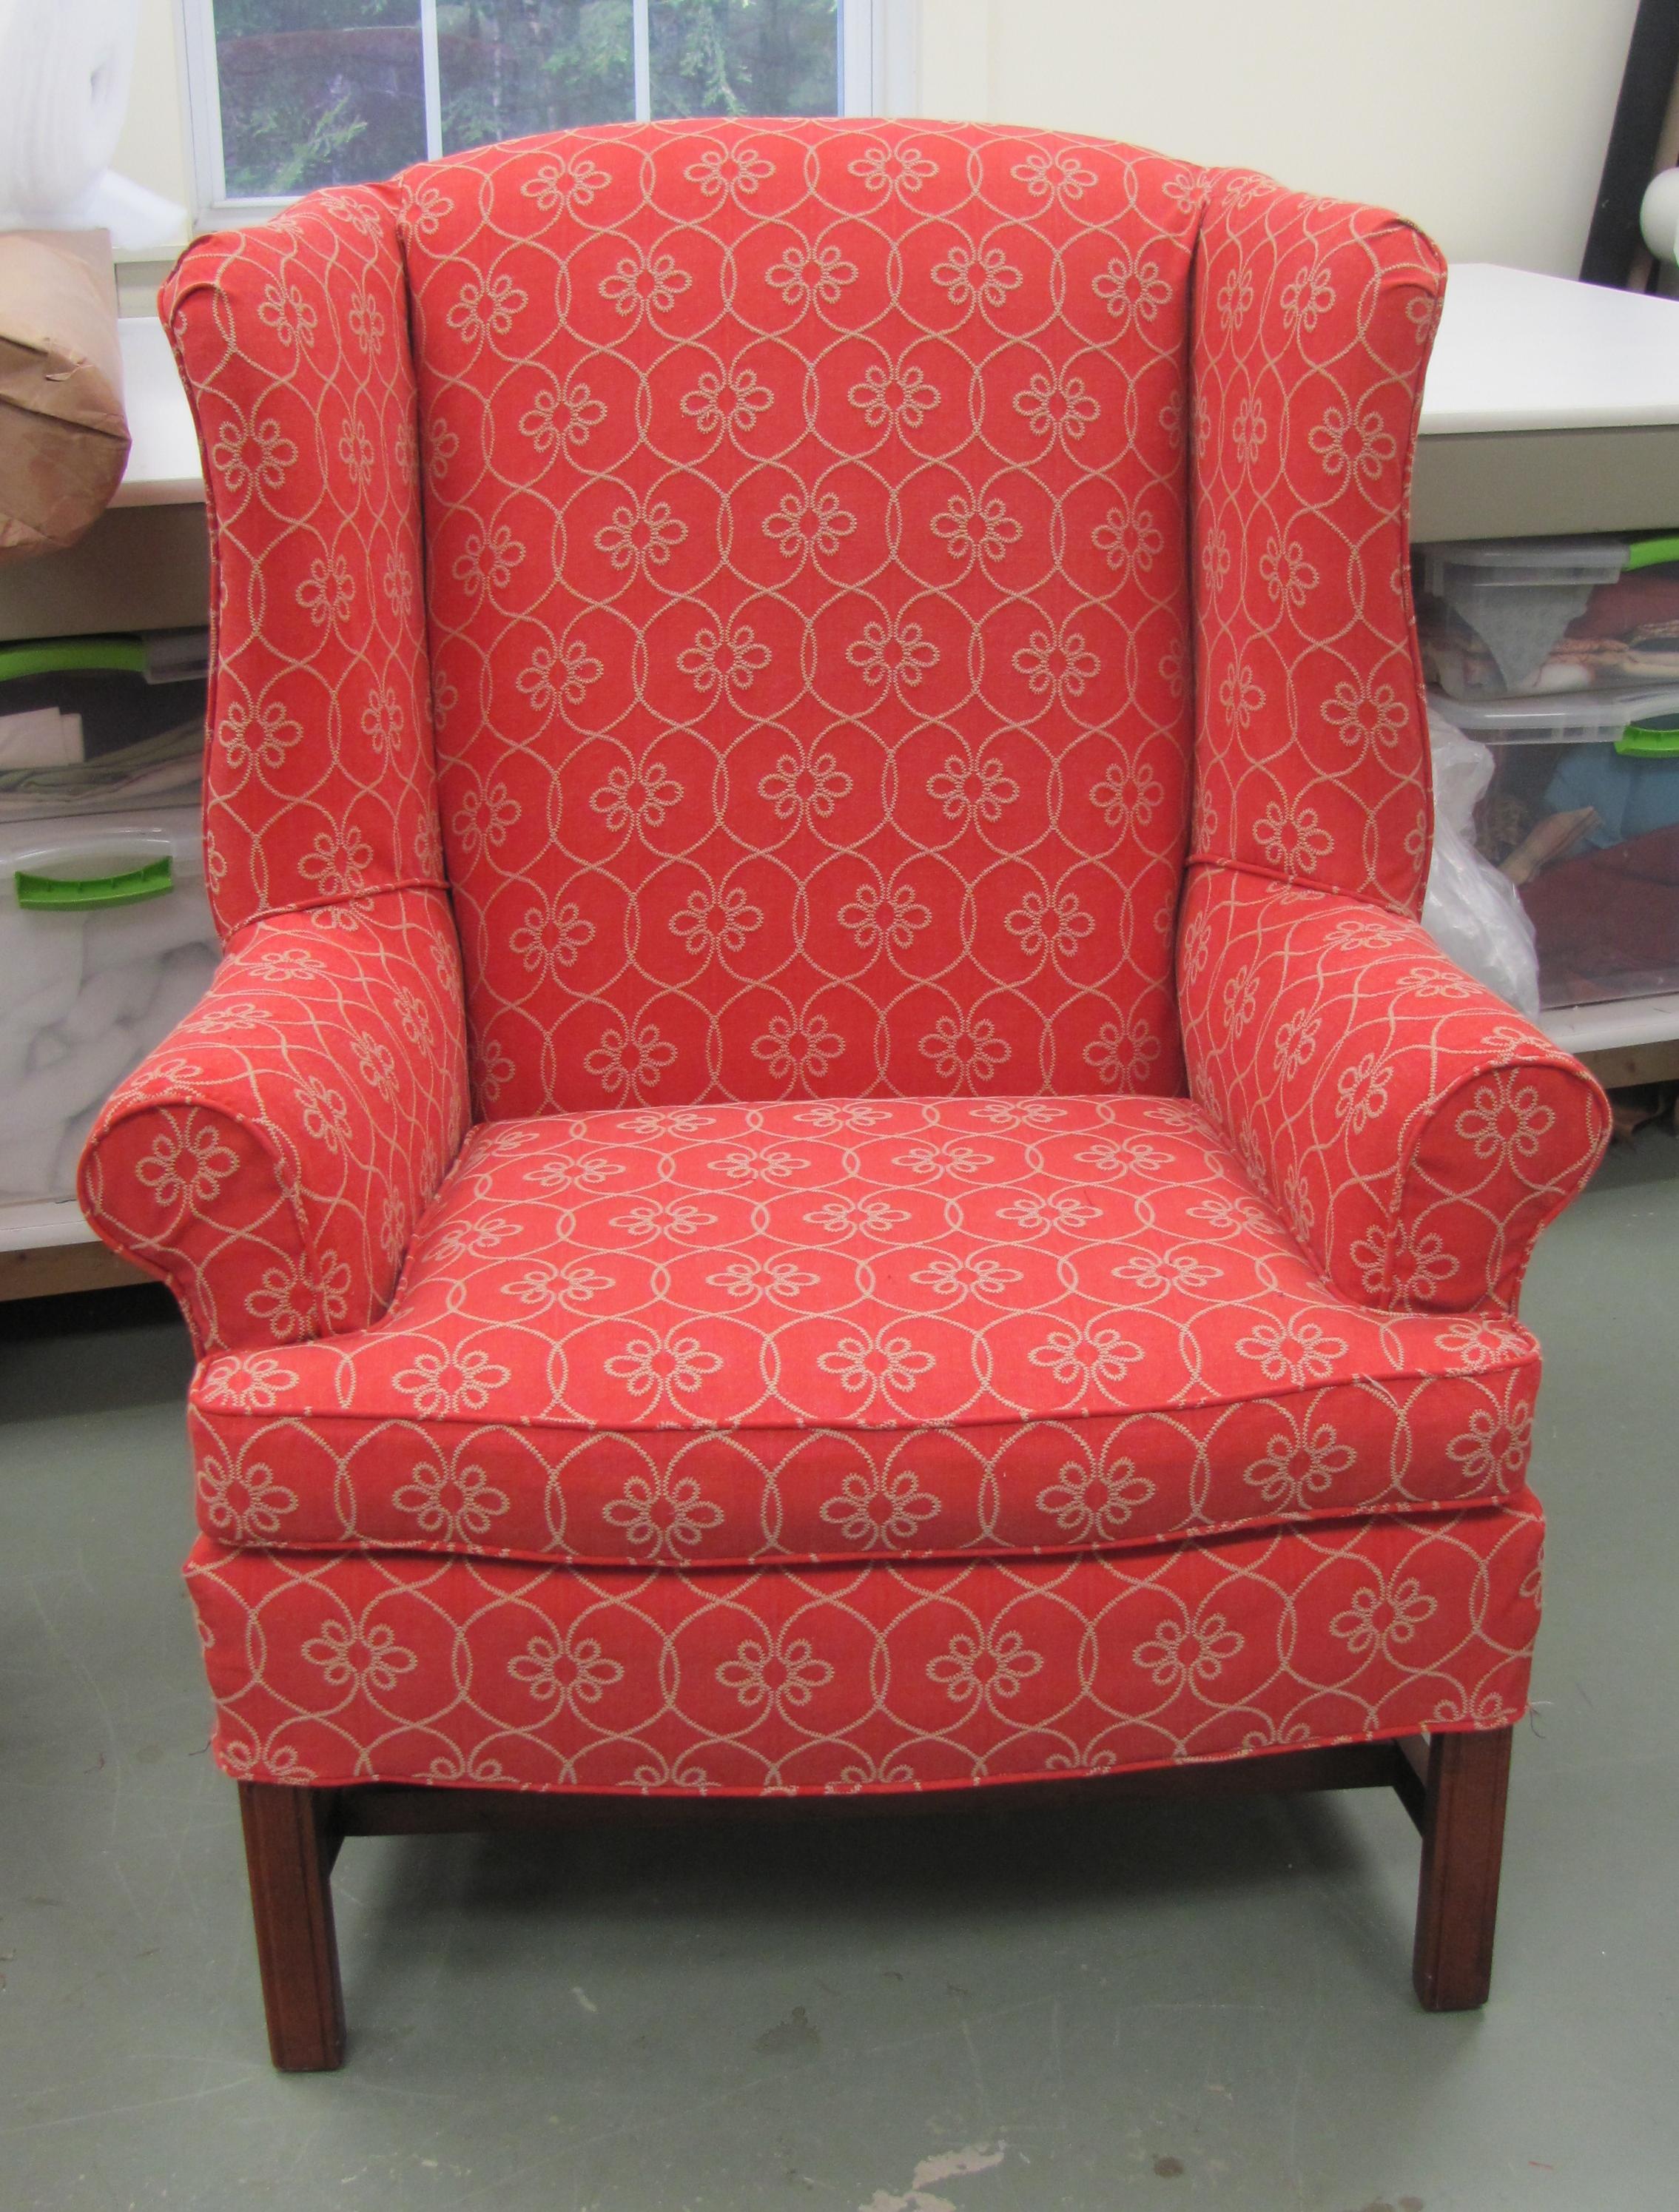 Slipcovered Furniture Debbiedoesdivans